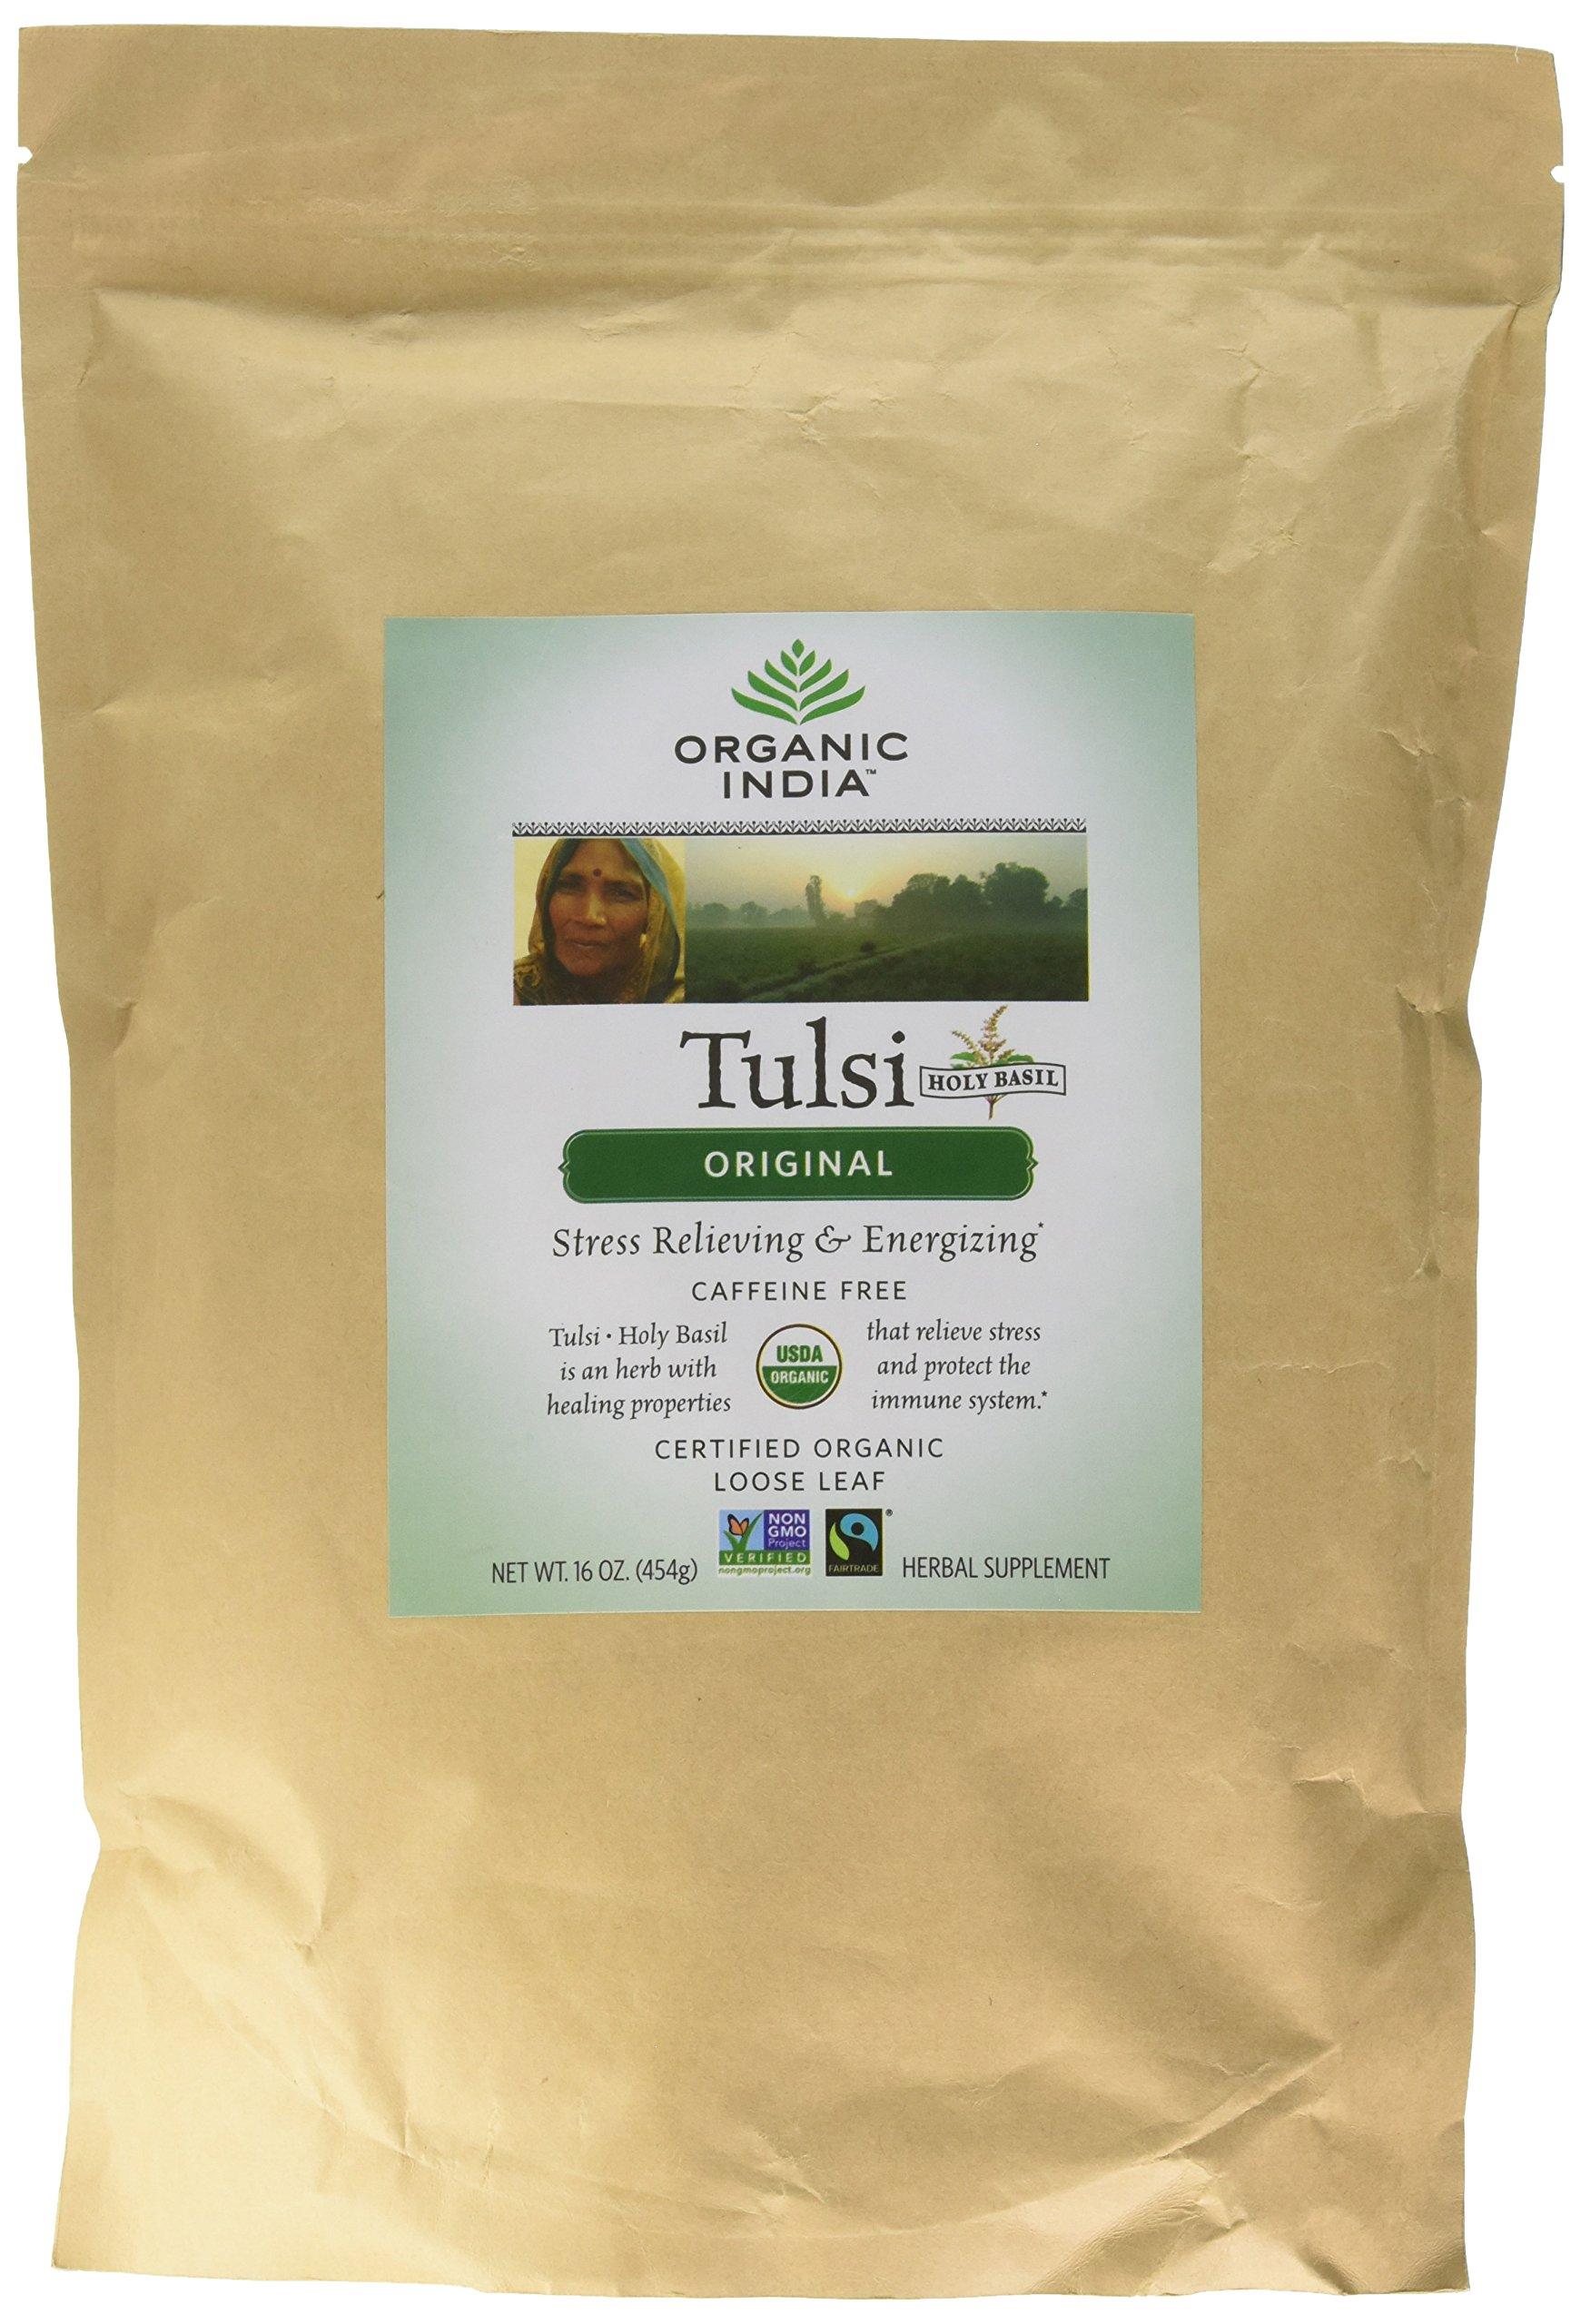 Organic India Tulsi Mix, 1 Pound